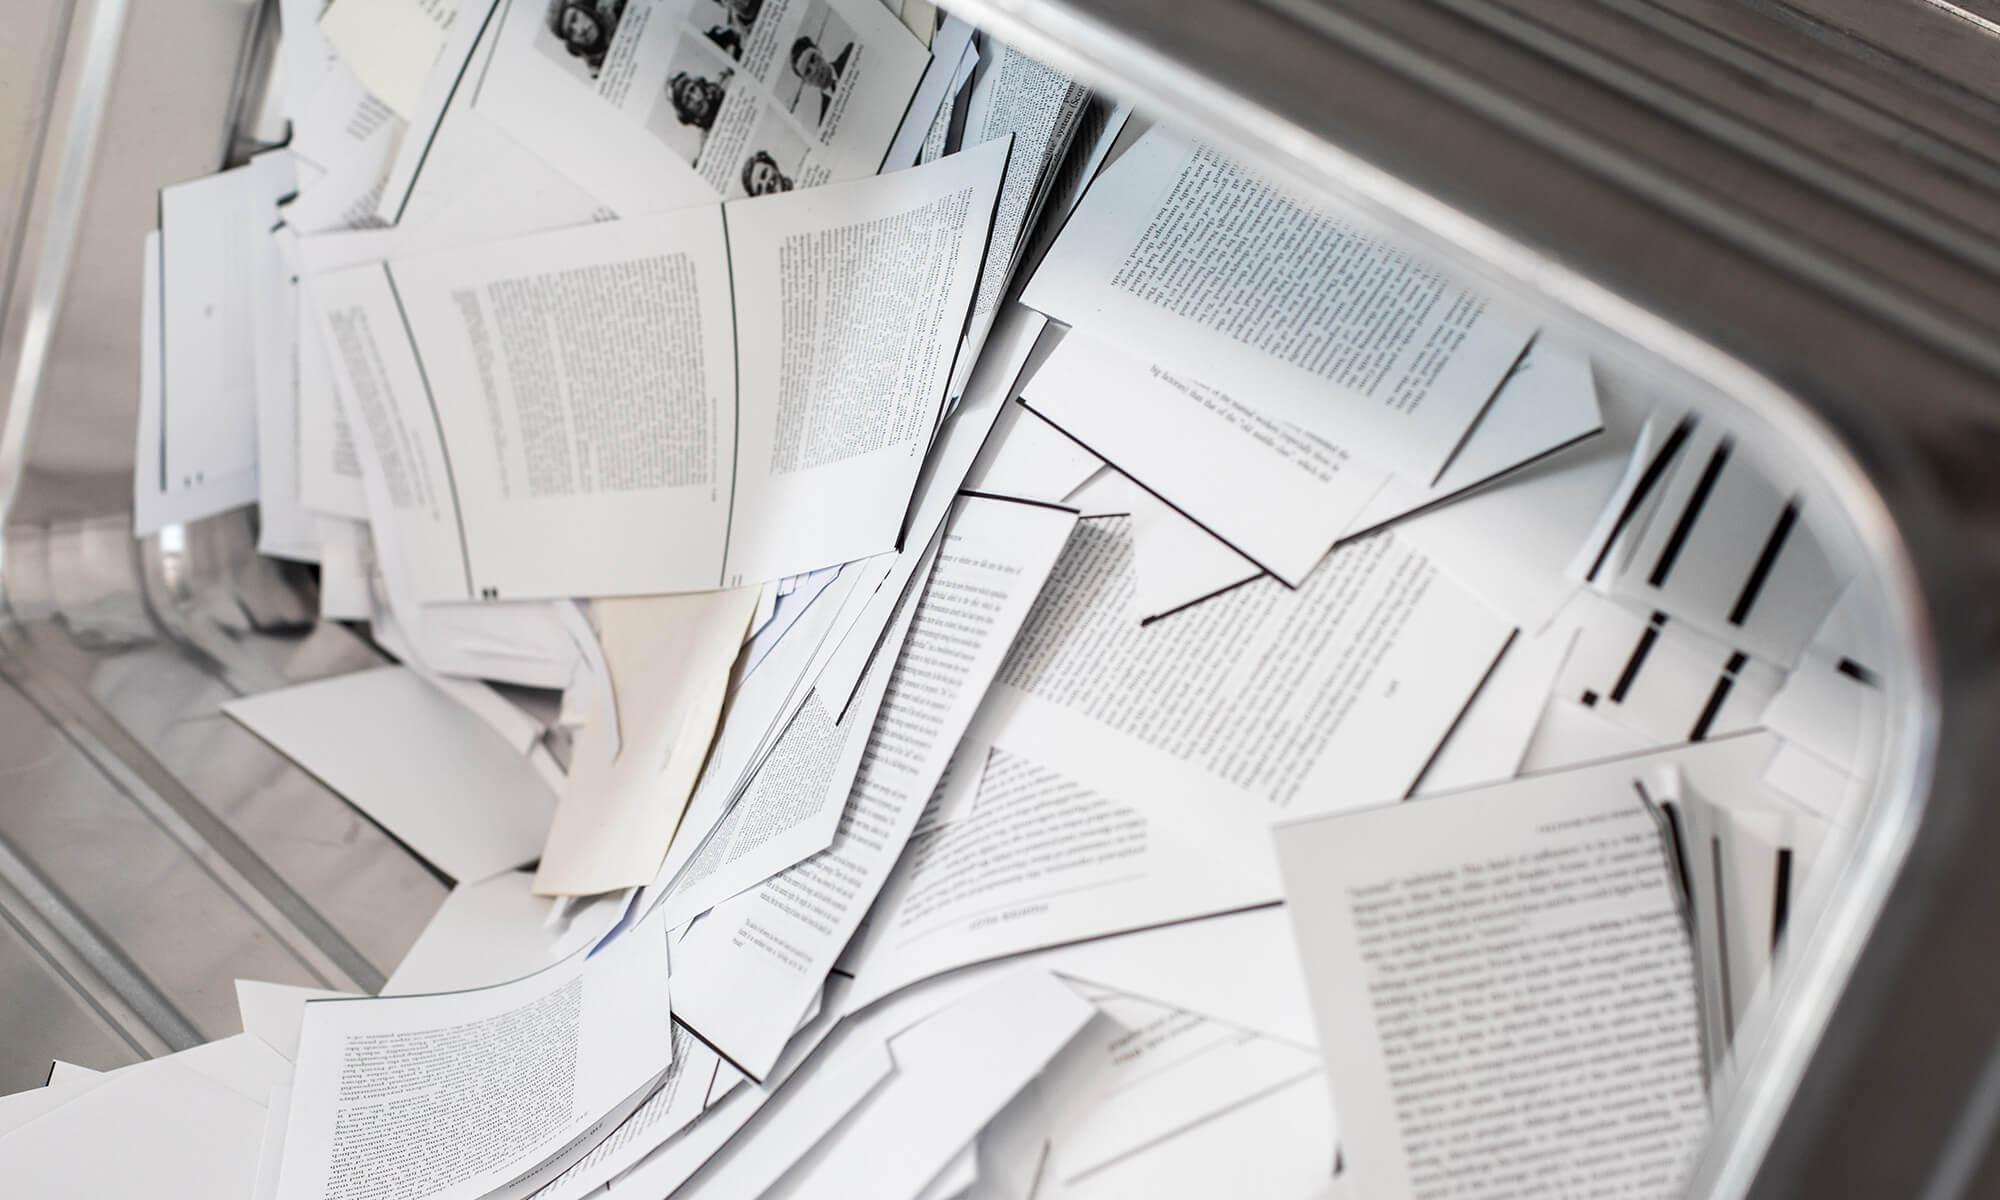 slide 3 - TJ Books - Passionate about print